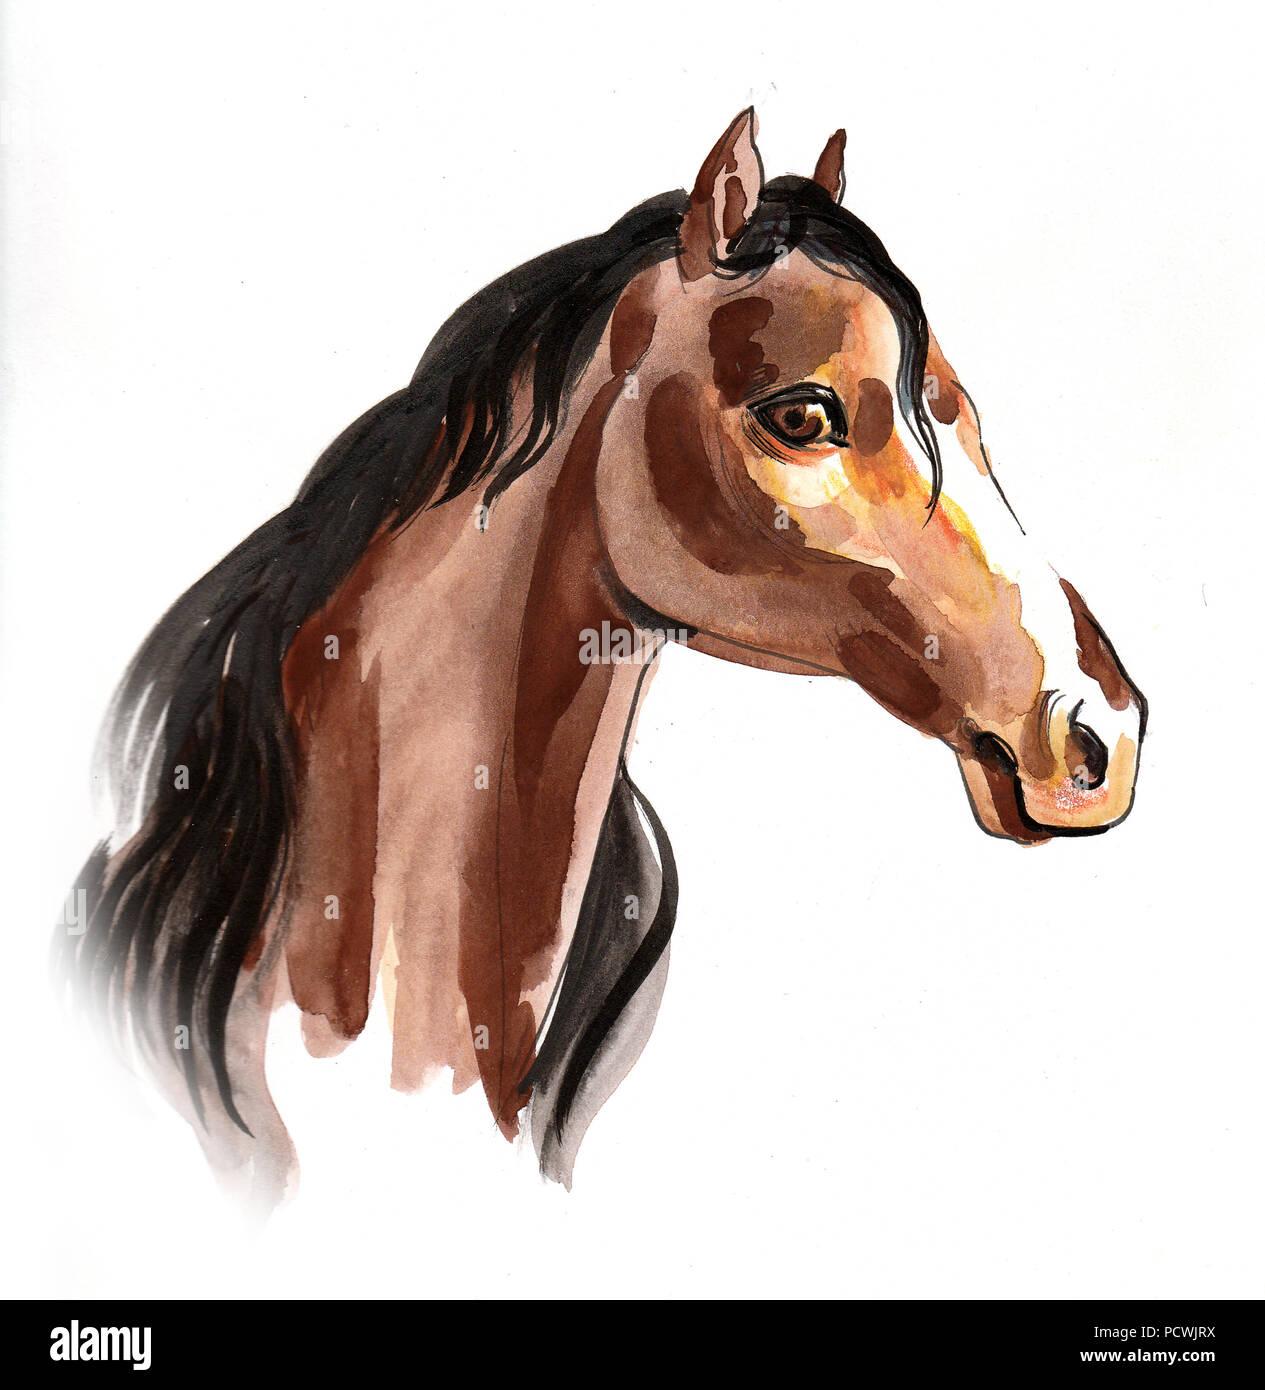 Watercolor Horse Head Stock Photo Alamy